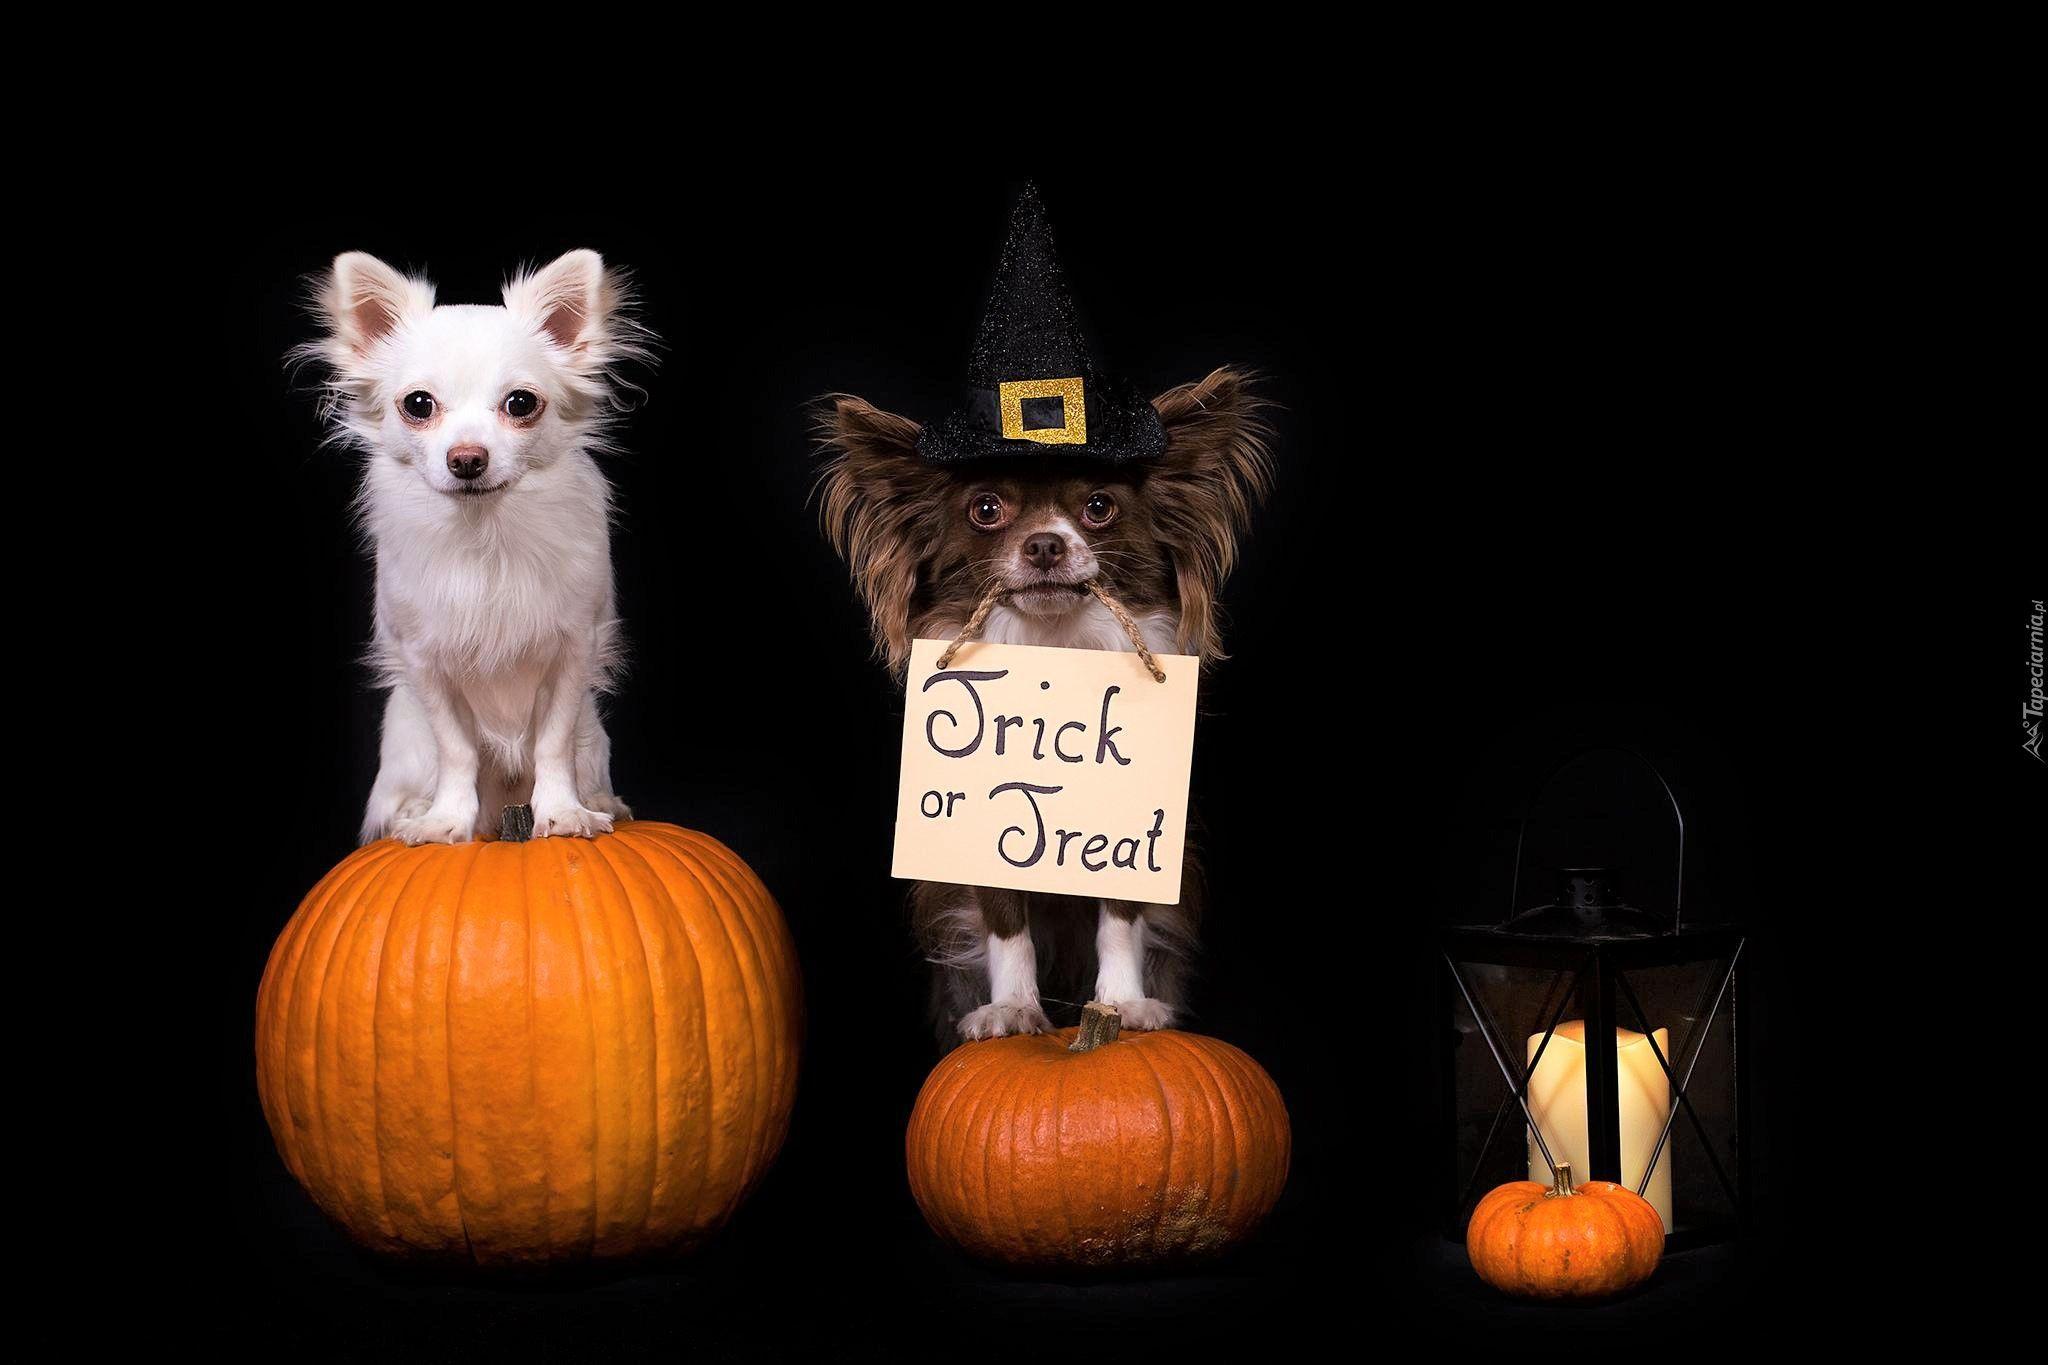 Great Wallpaper Halloween Puppy - c9f3409e73d089fc2d87e4470d199f9c  Image_347181.jpg